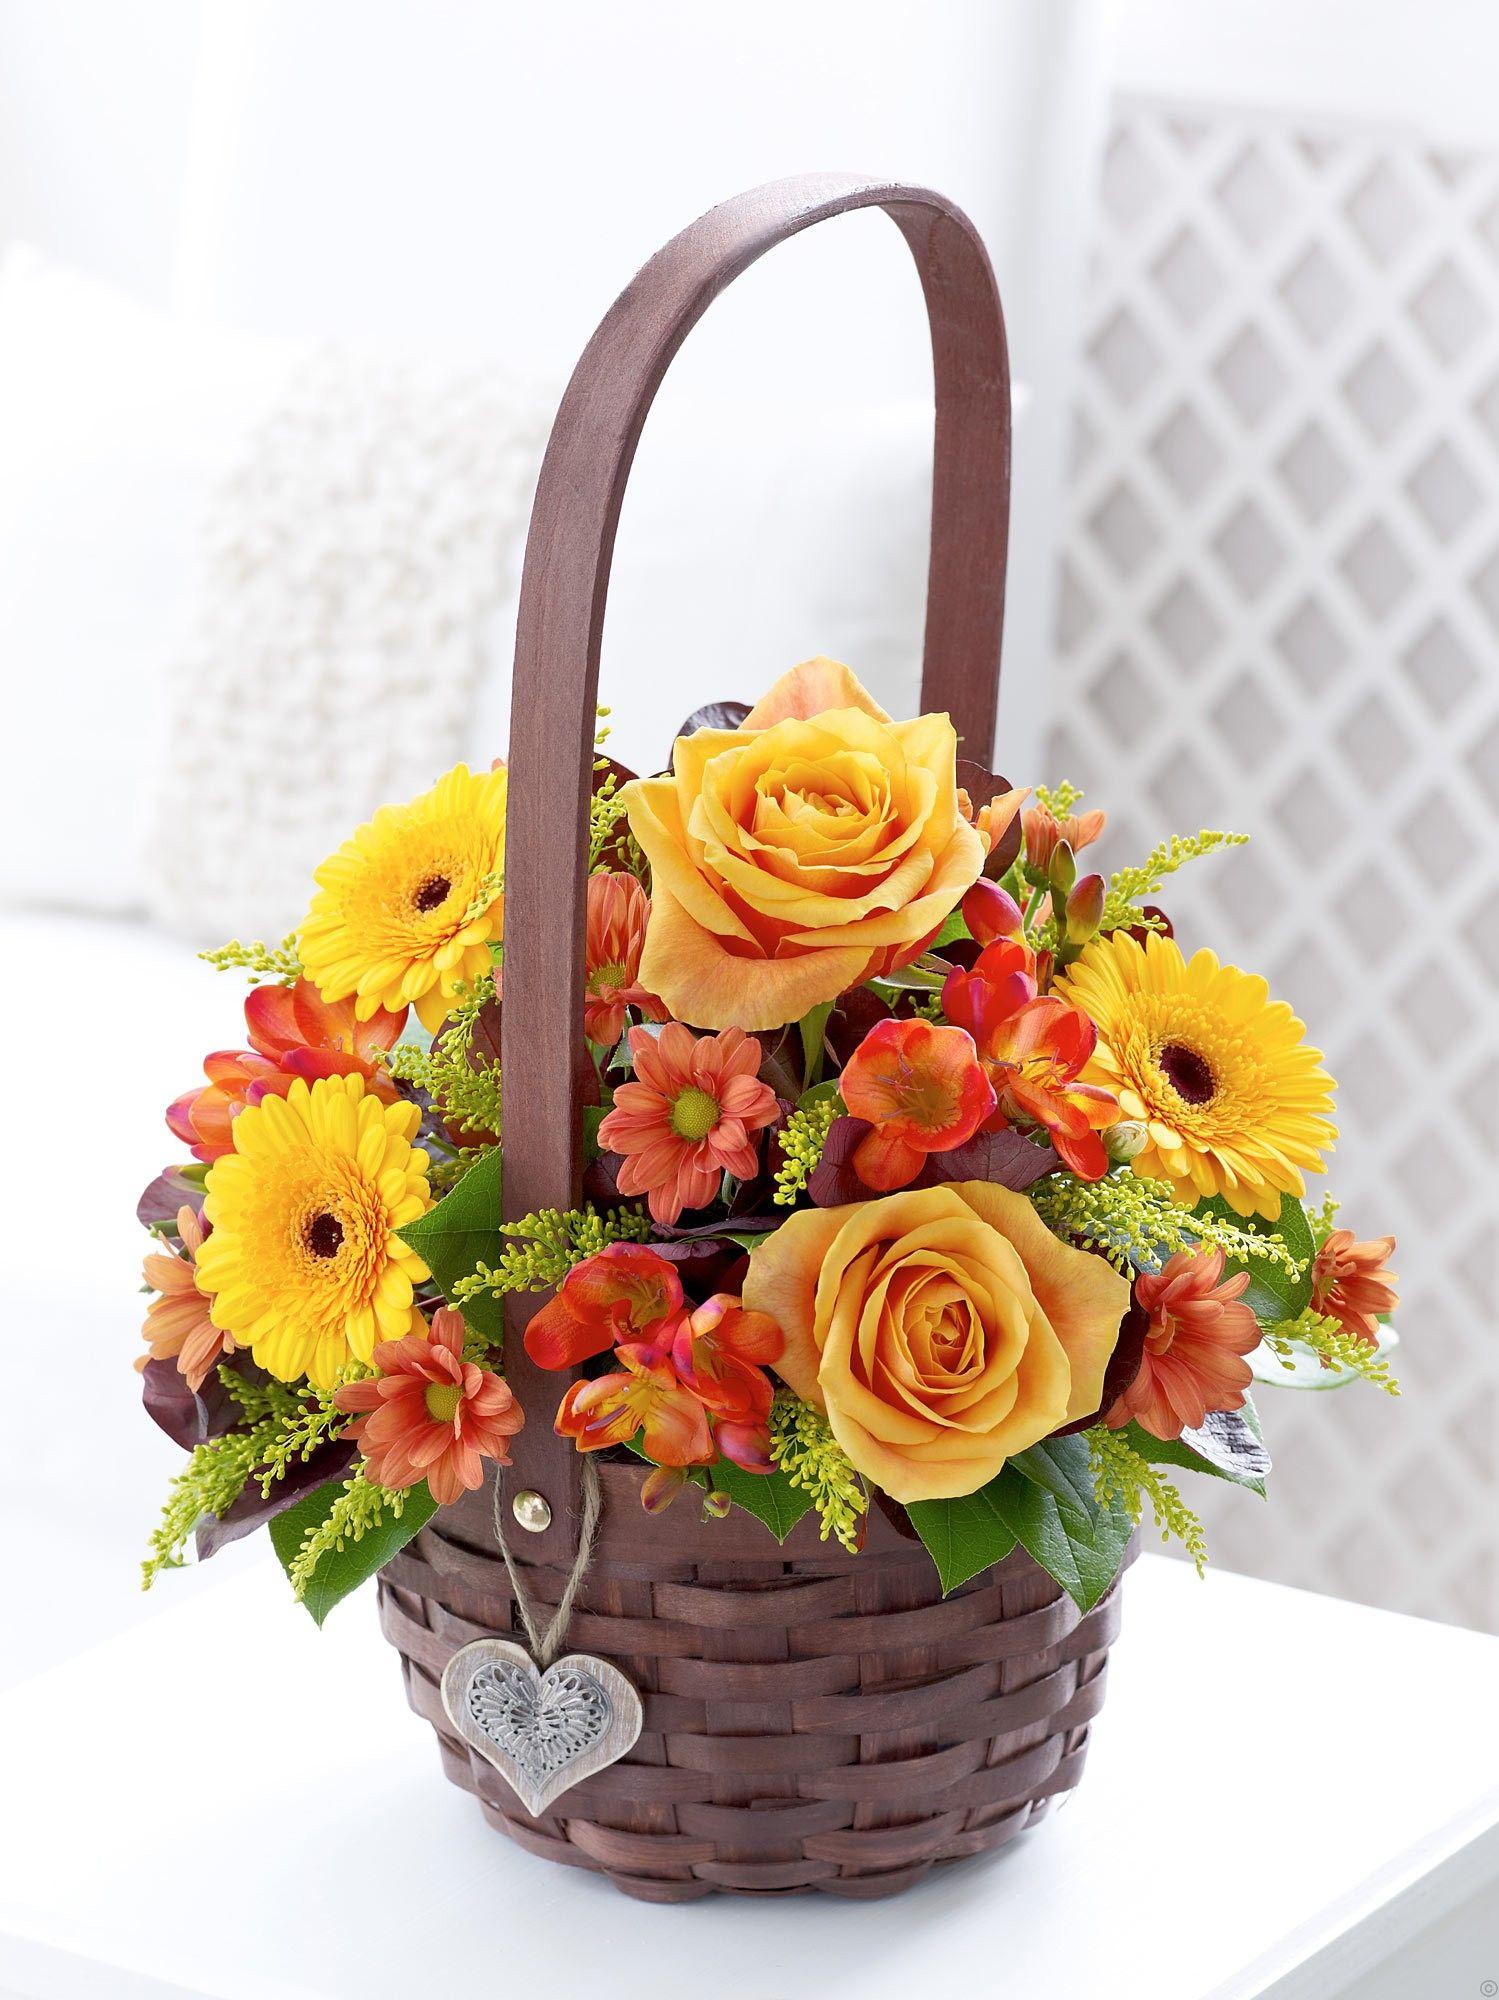 Корзинки под цветы подарки, база